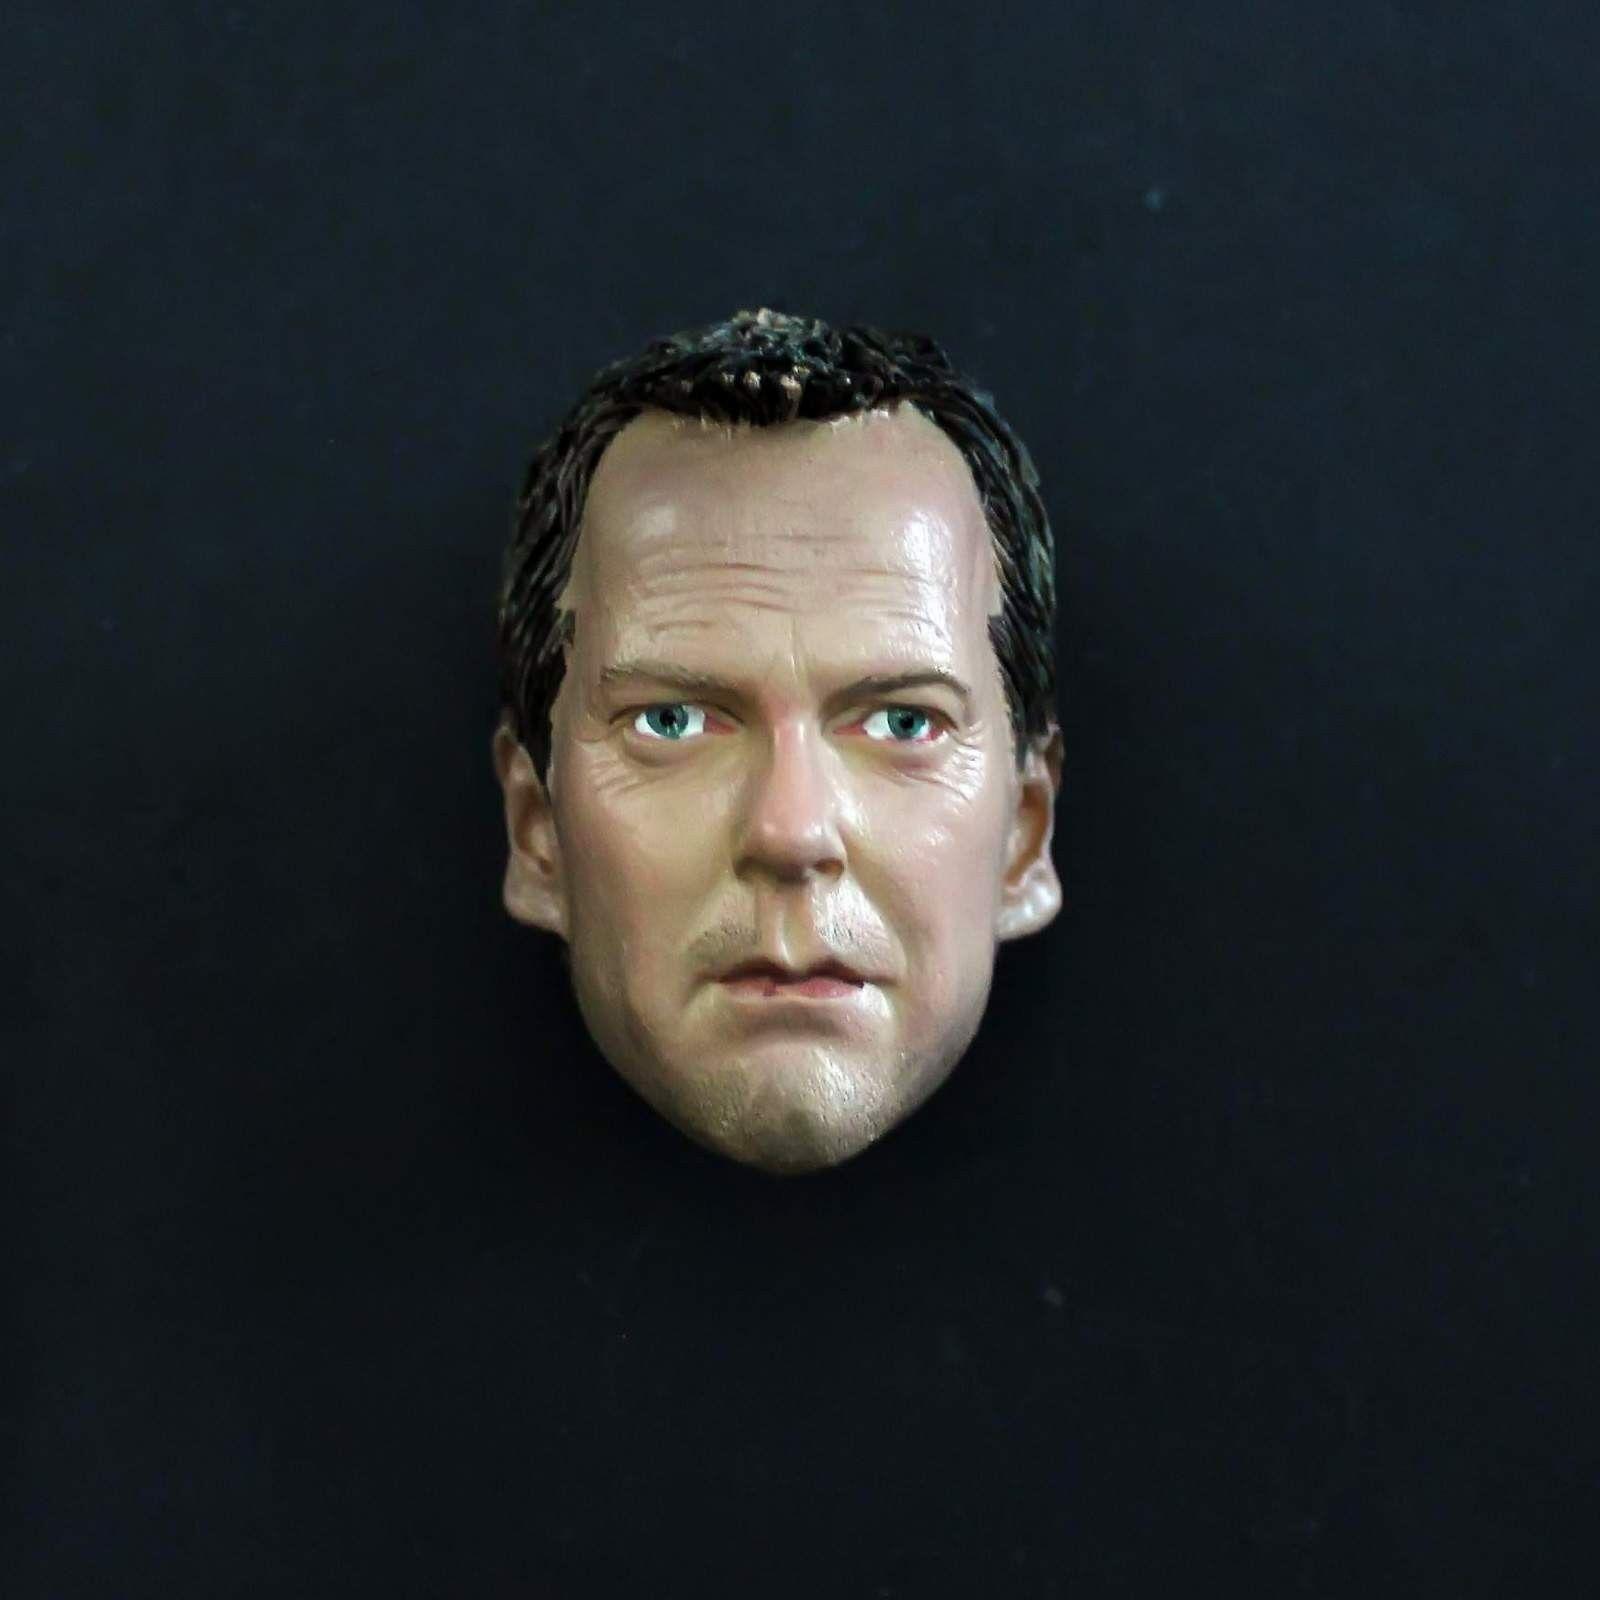 TC76-48 1 6 Scale HOT Male Head Sculpt TOYS